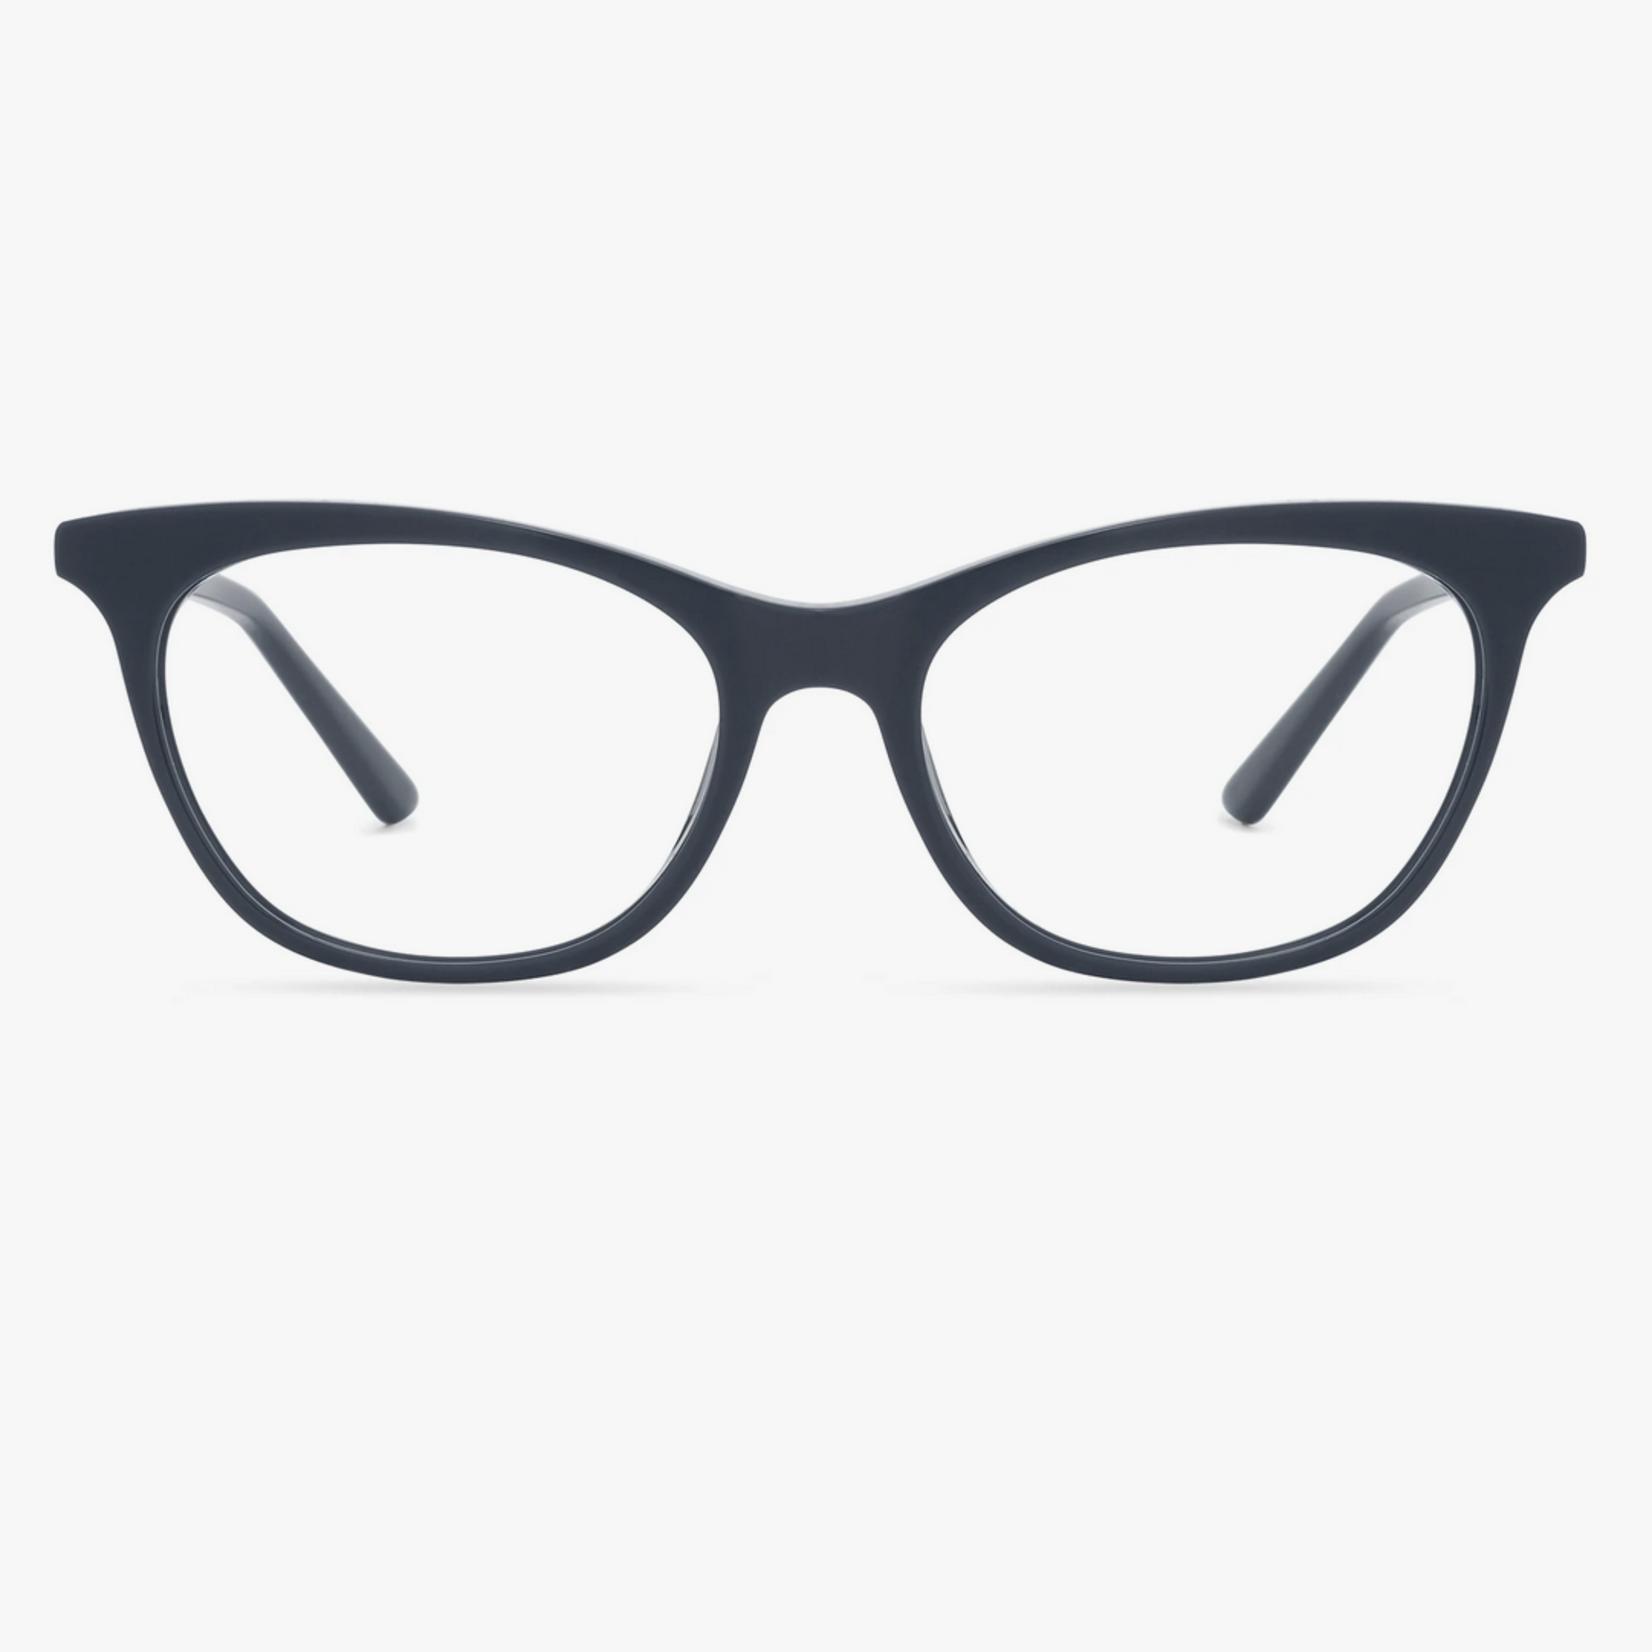 Diff - Jade blue light glasses